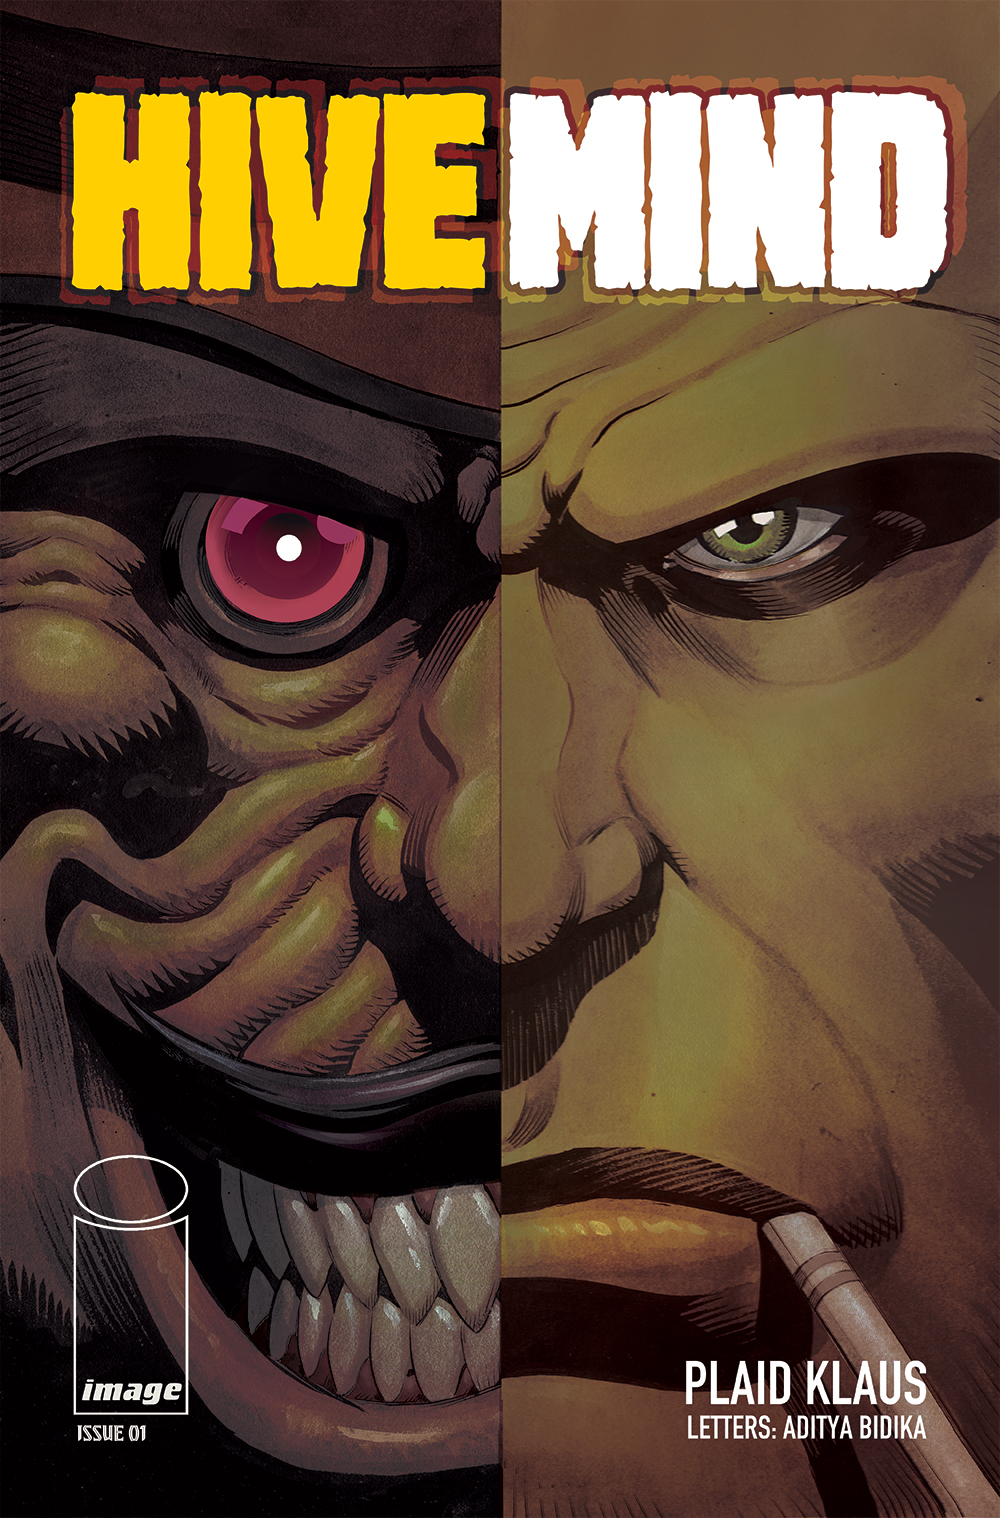 HiveMind-Issue01-0.jpg